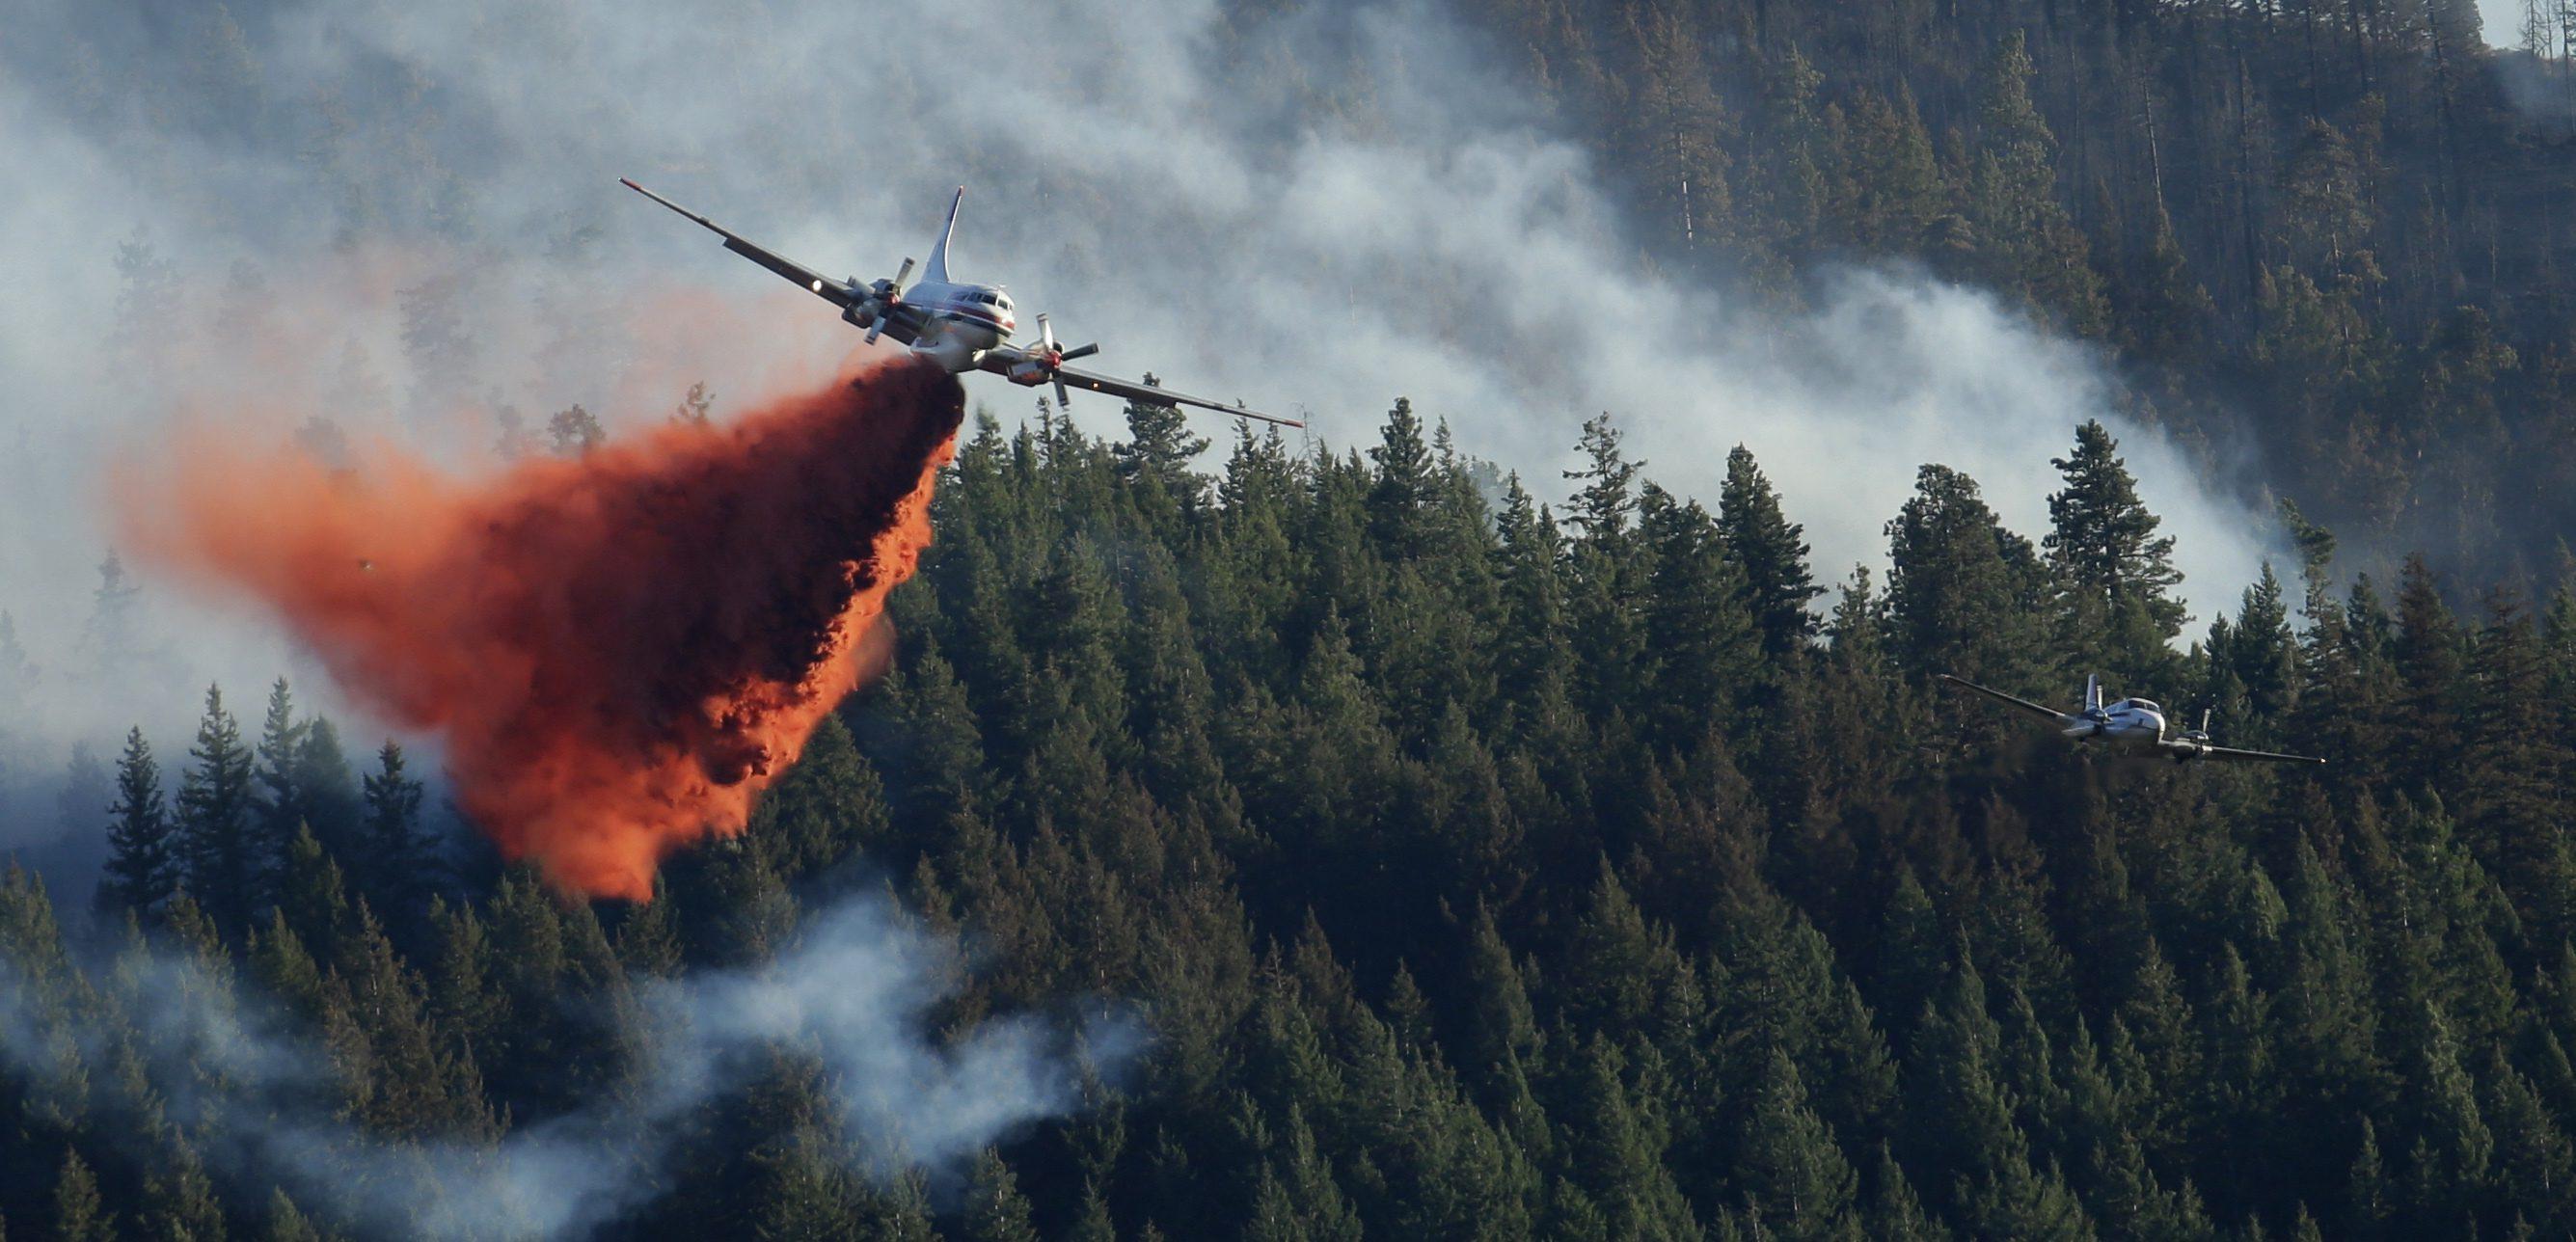 fire fighting plane